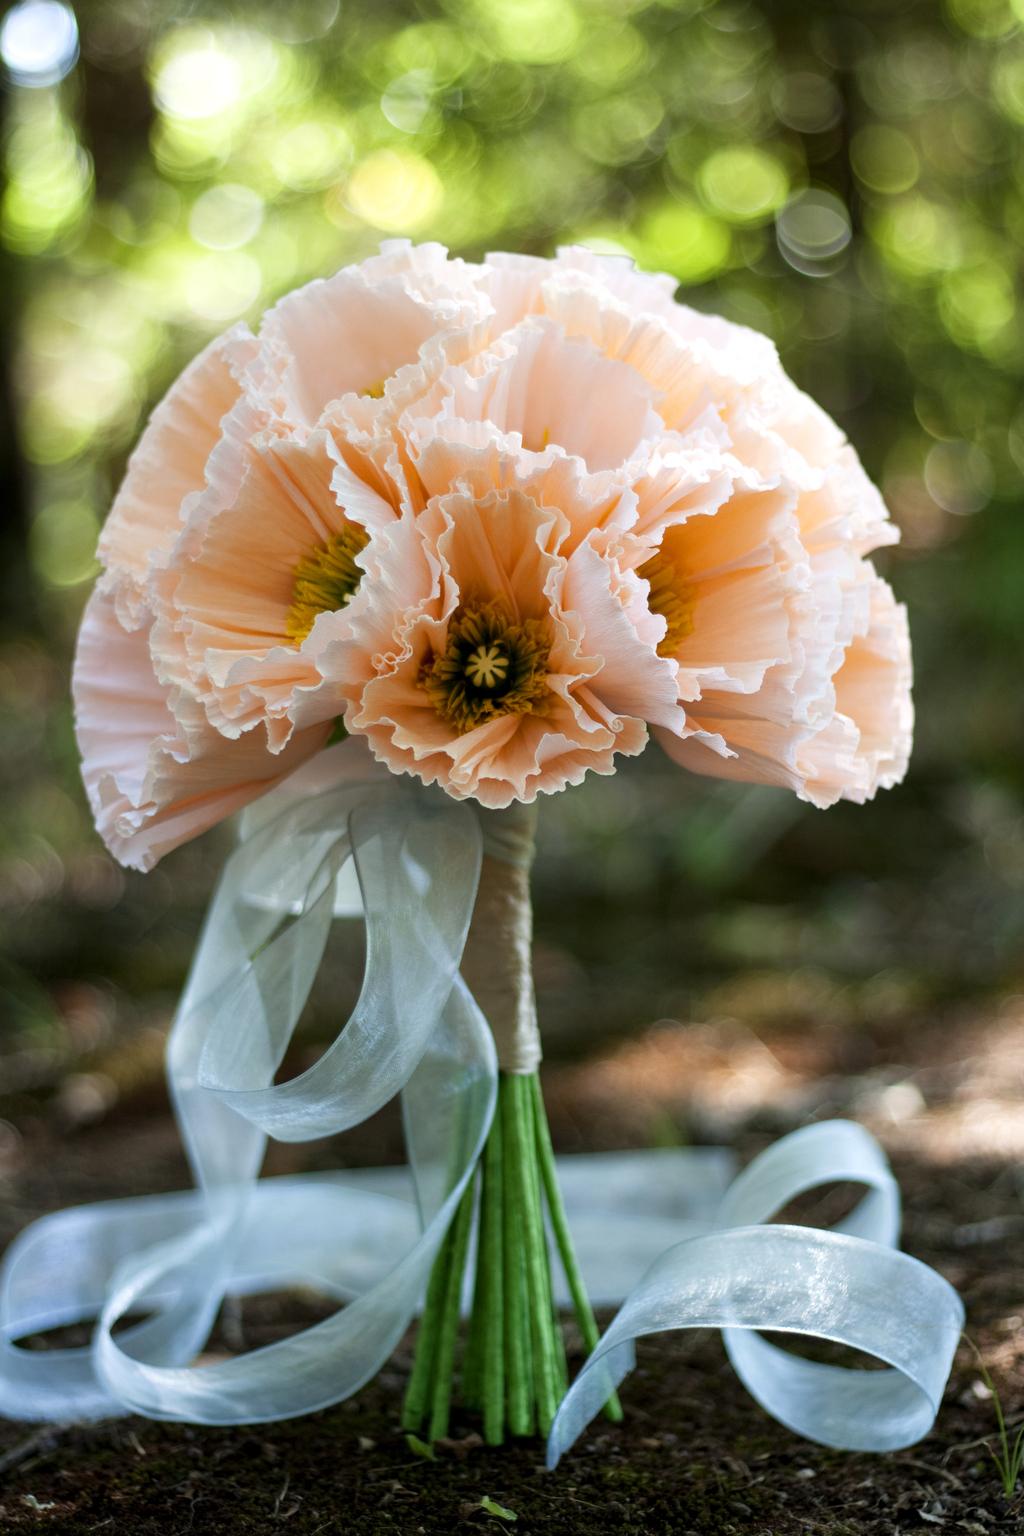 Unique-wedding-flowers-paper-bridal-bouquets-diy-wedding-ideas.full